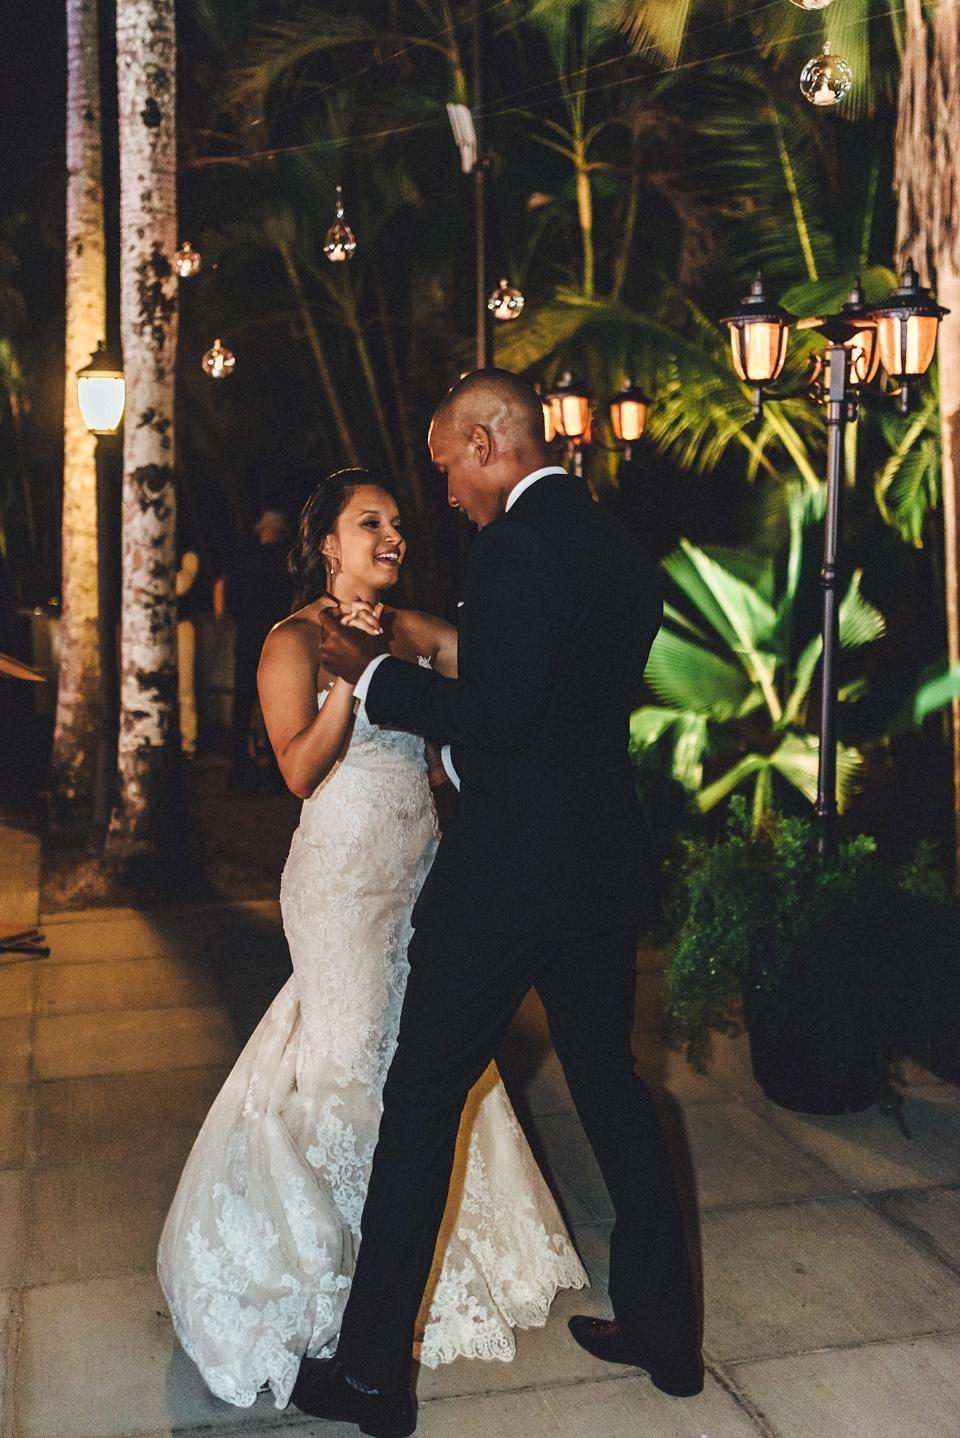 blog-wedding-photographer_0705 Niki & Kerron Wedding & Carnival Trinidad. Photo & FilmNiki & Kerron Wedding & Carnival Trinidad. Photo & Filmblog wedding photographer 0705